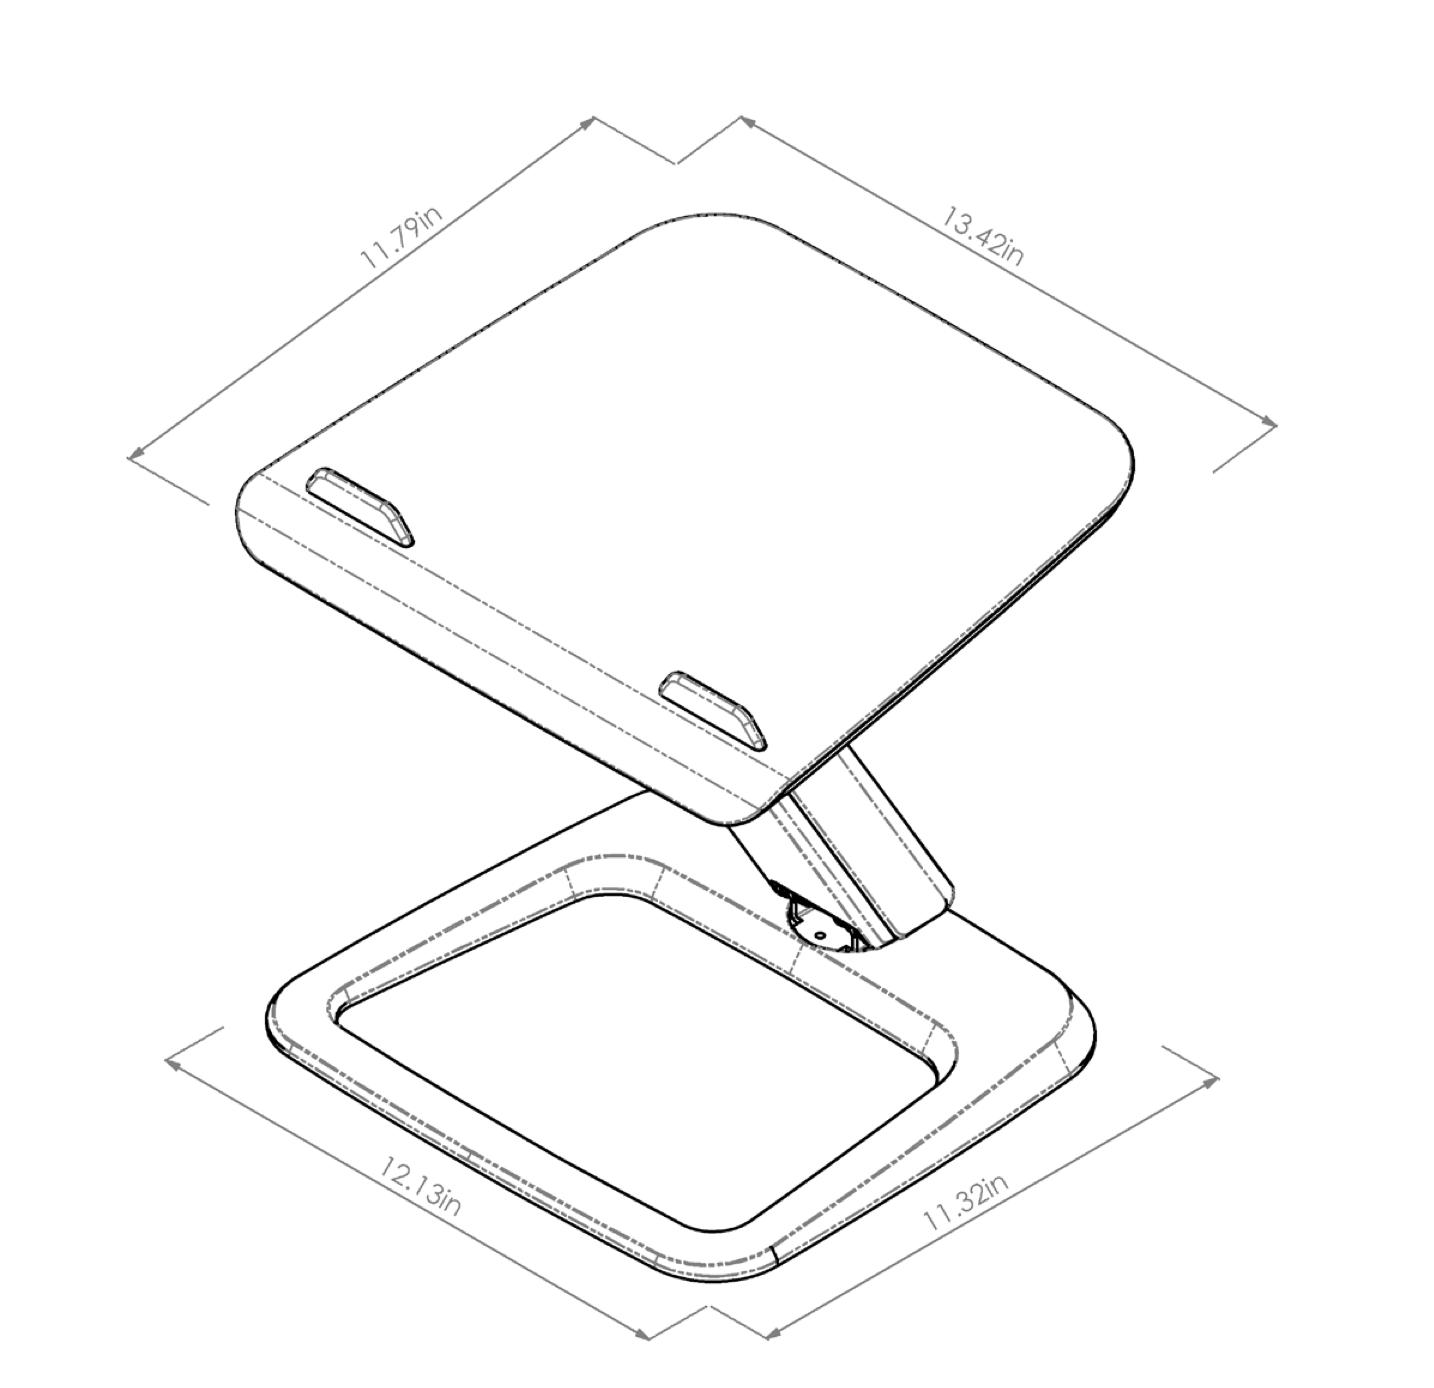 esi hana laptop support dimensions - 4